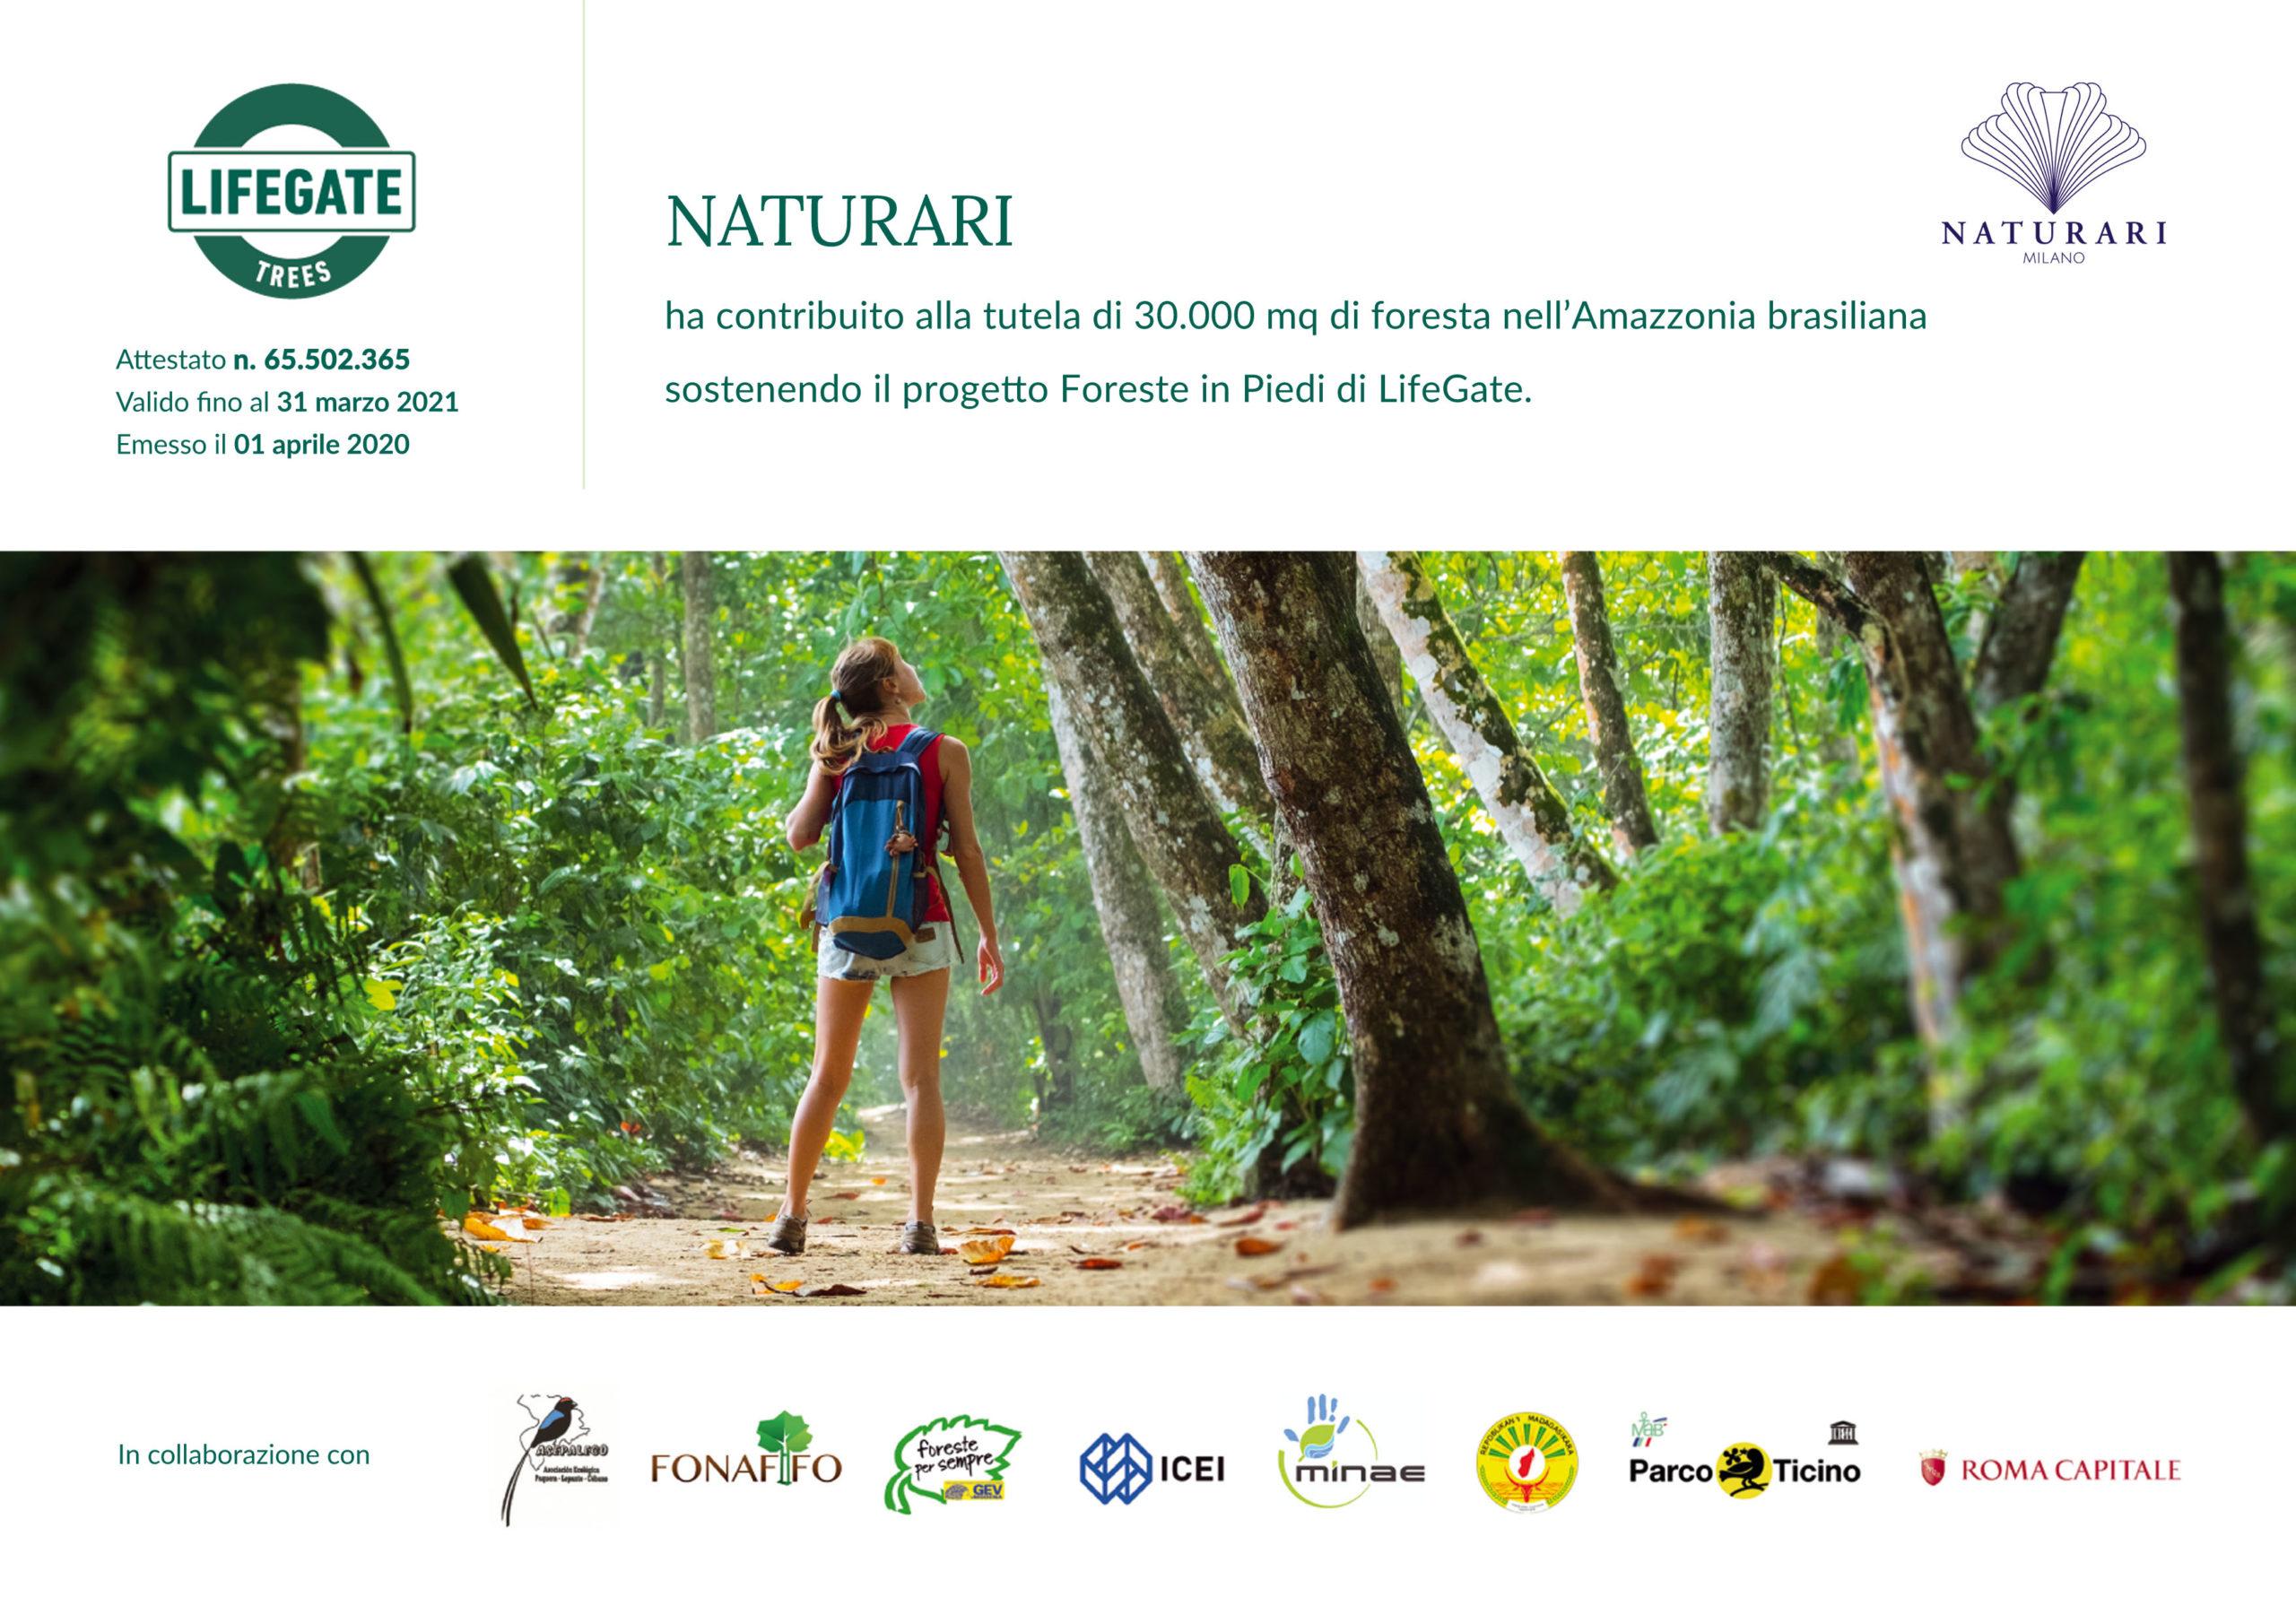 Naturari per l'ambiente